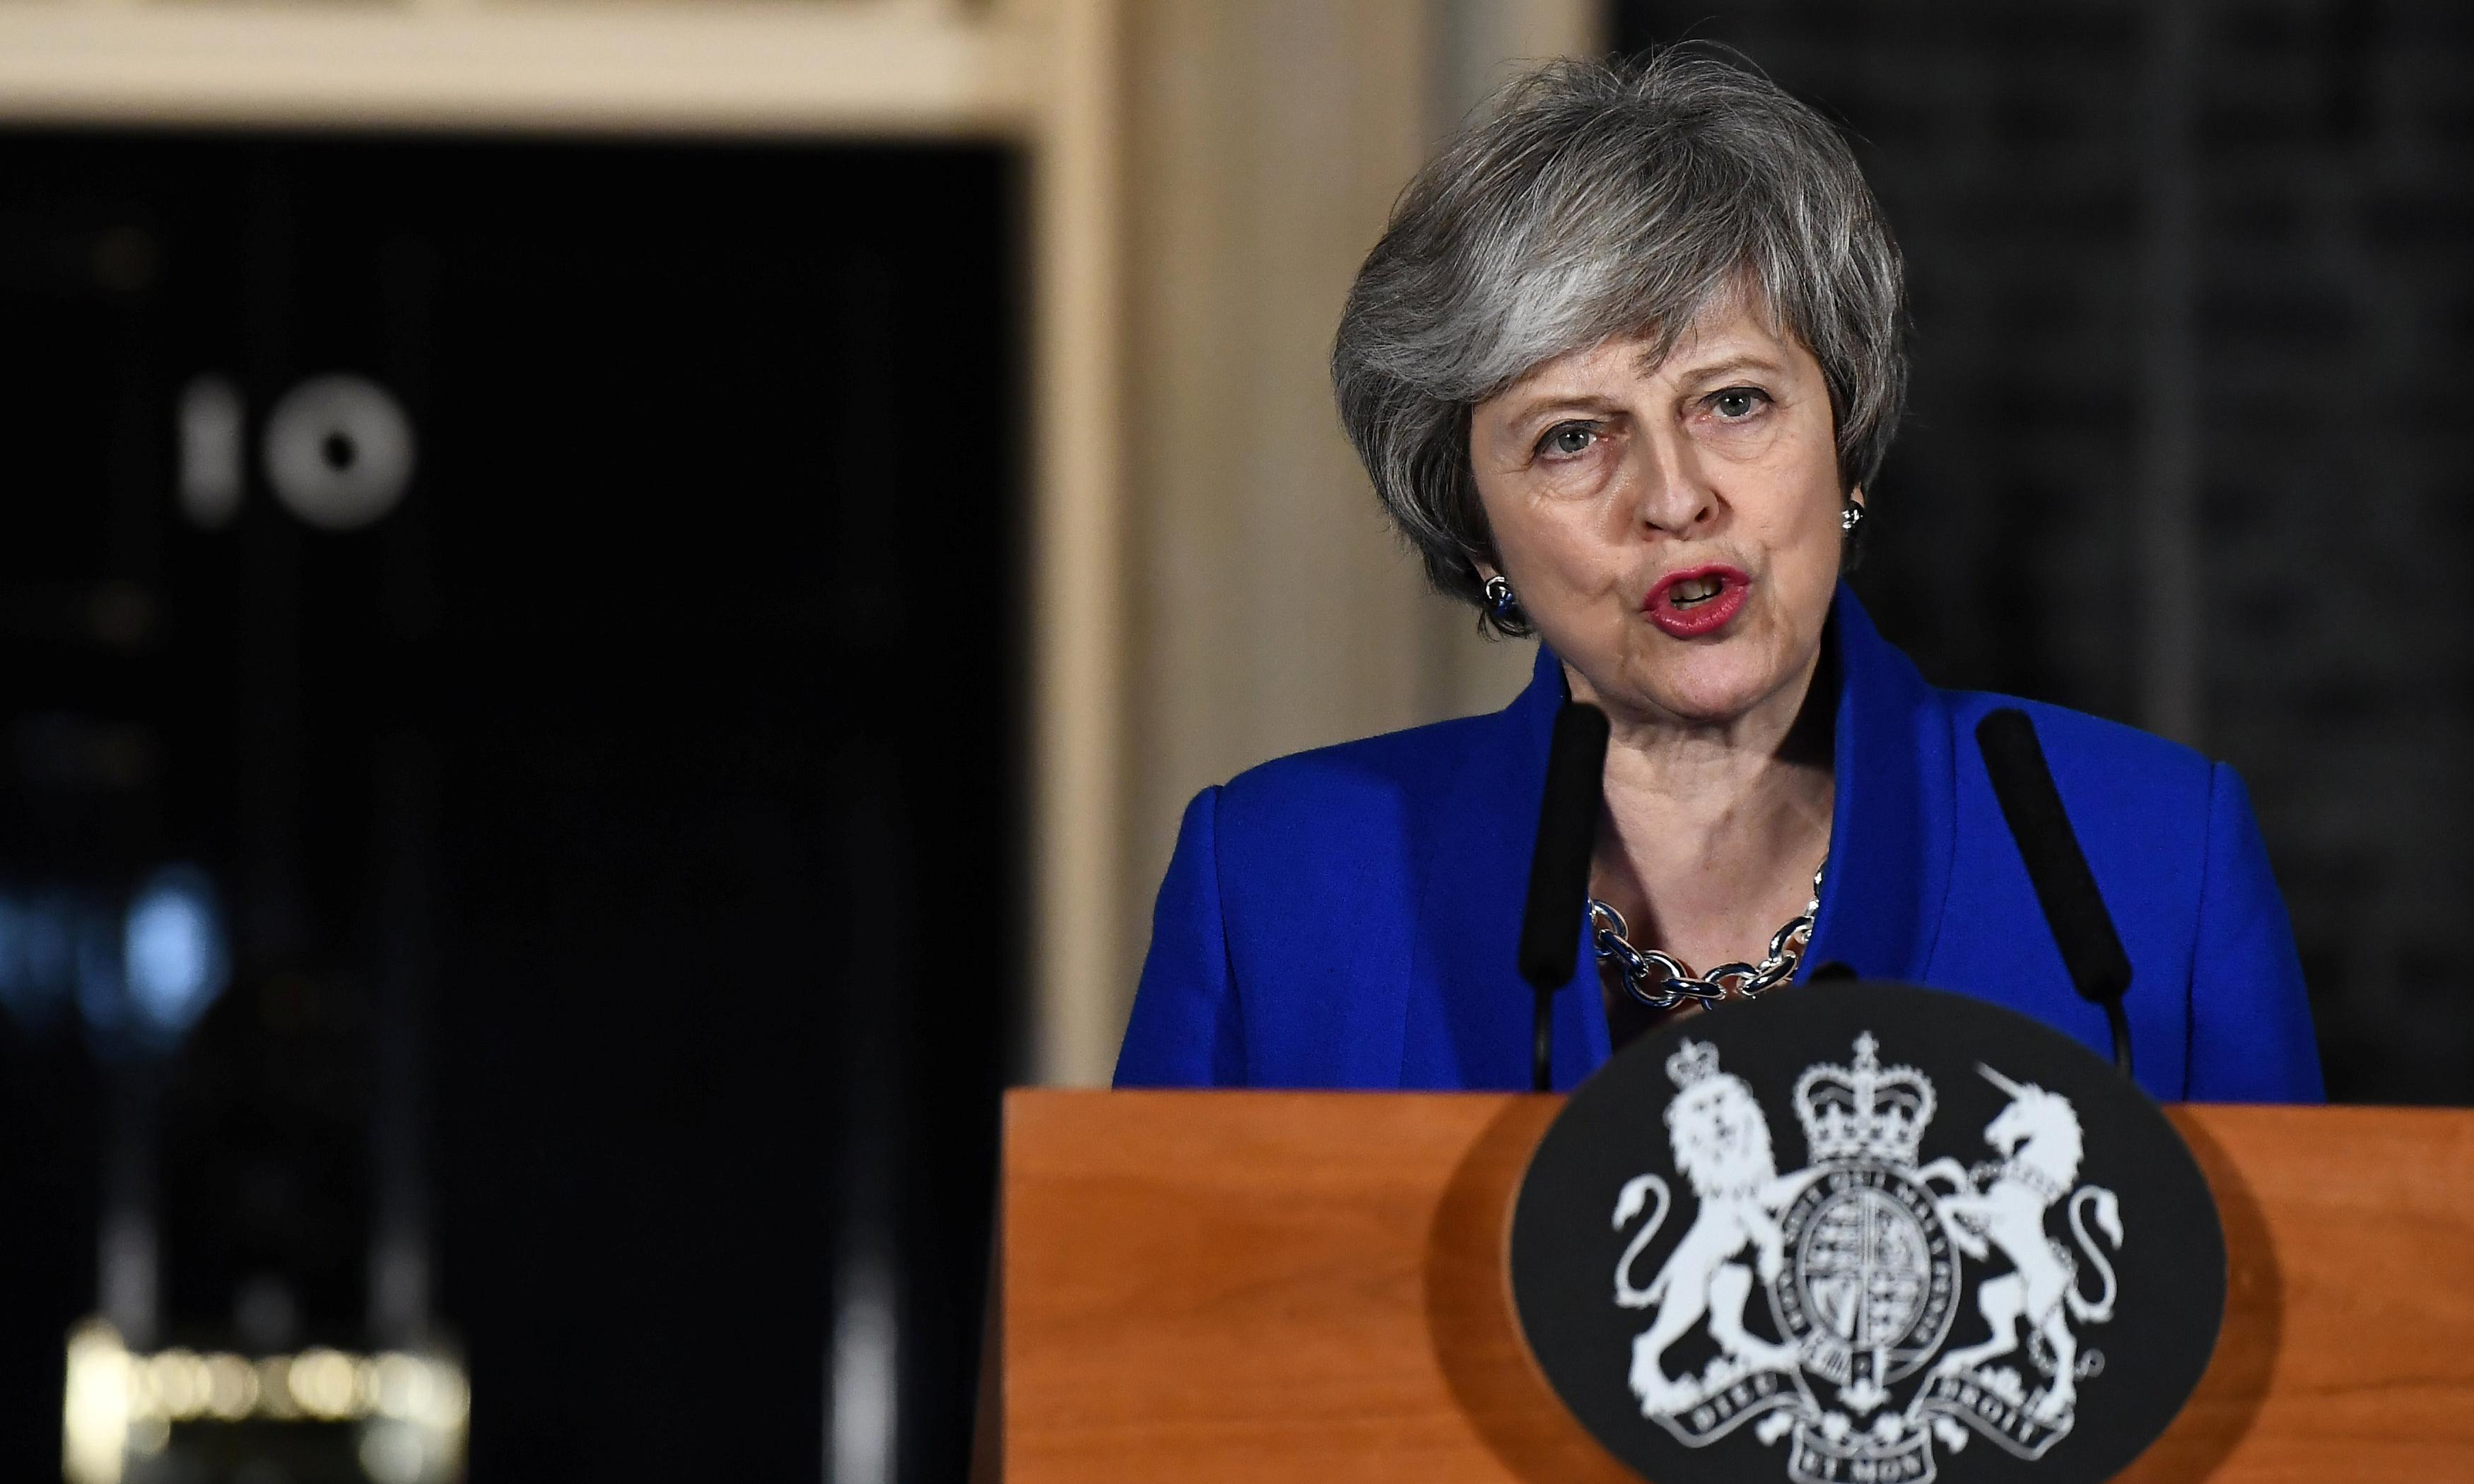 MPs to ambush May with amendments to stop no-deal Brexit